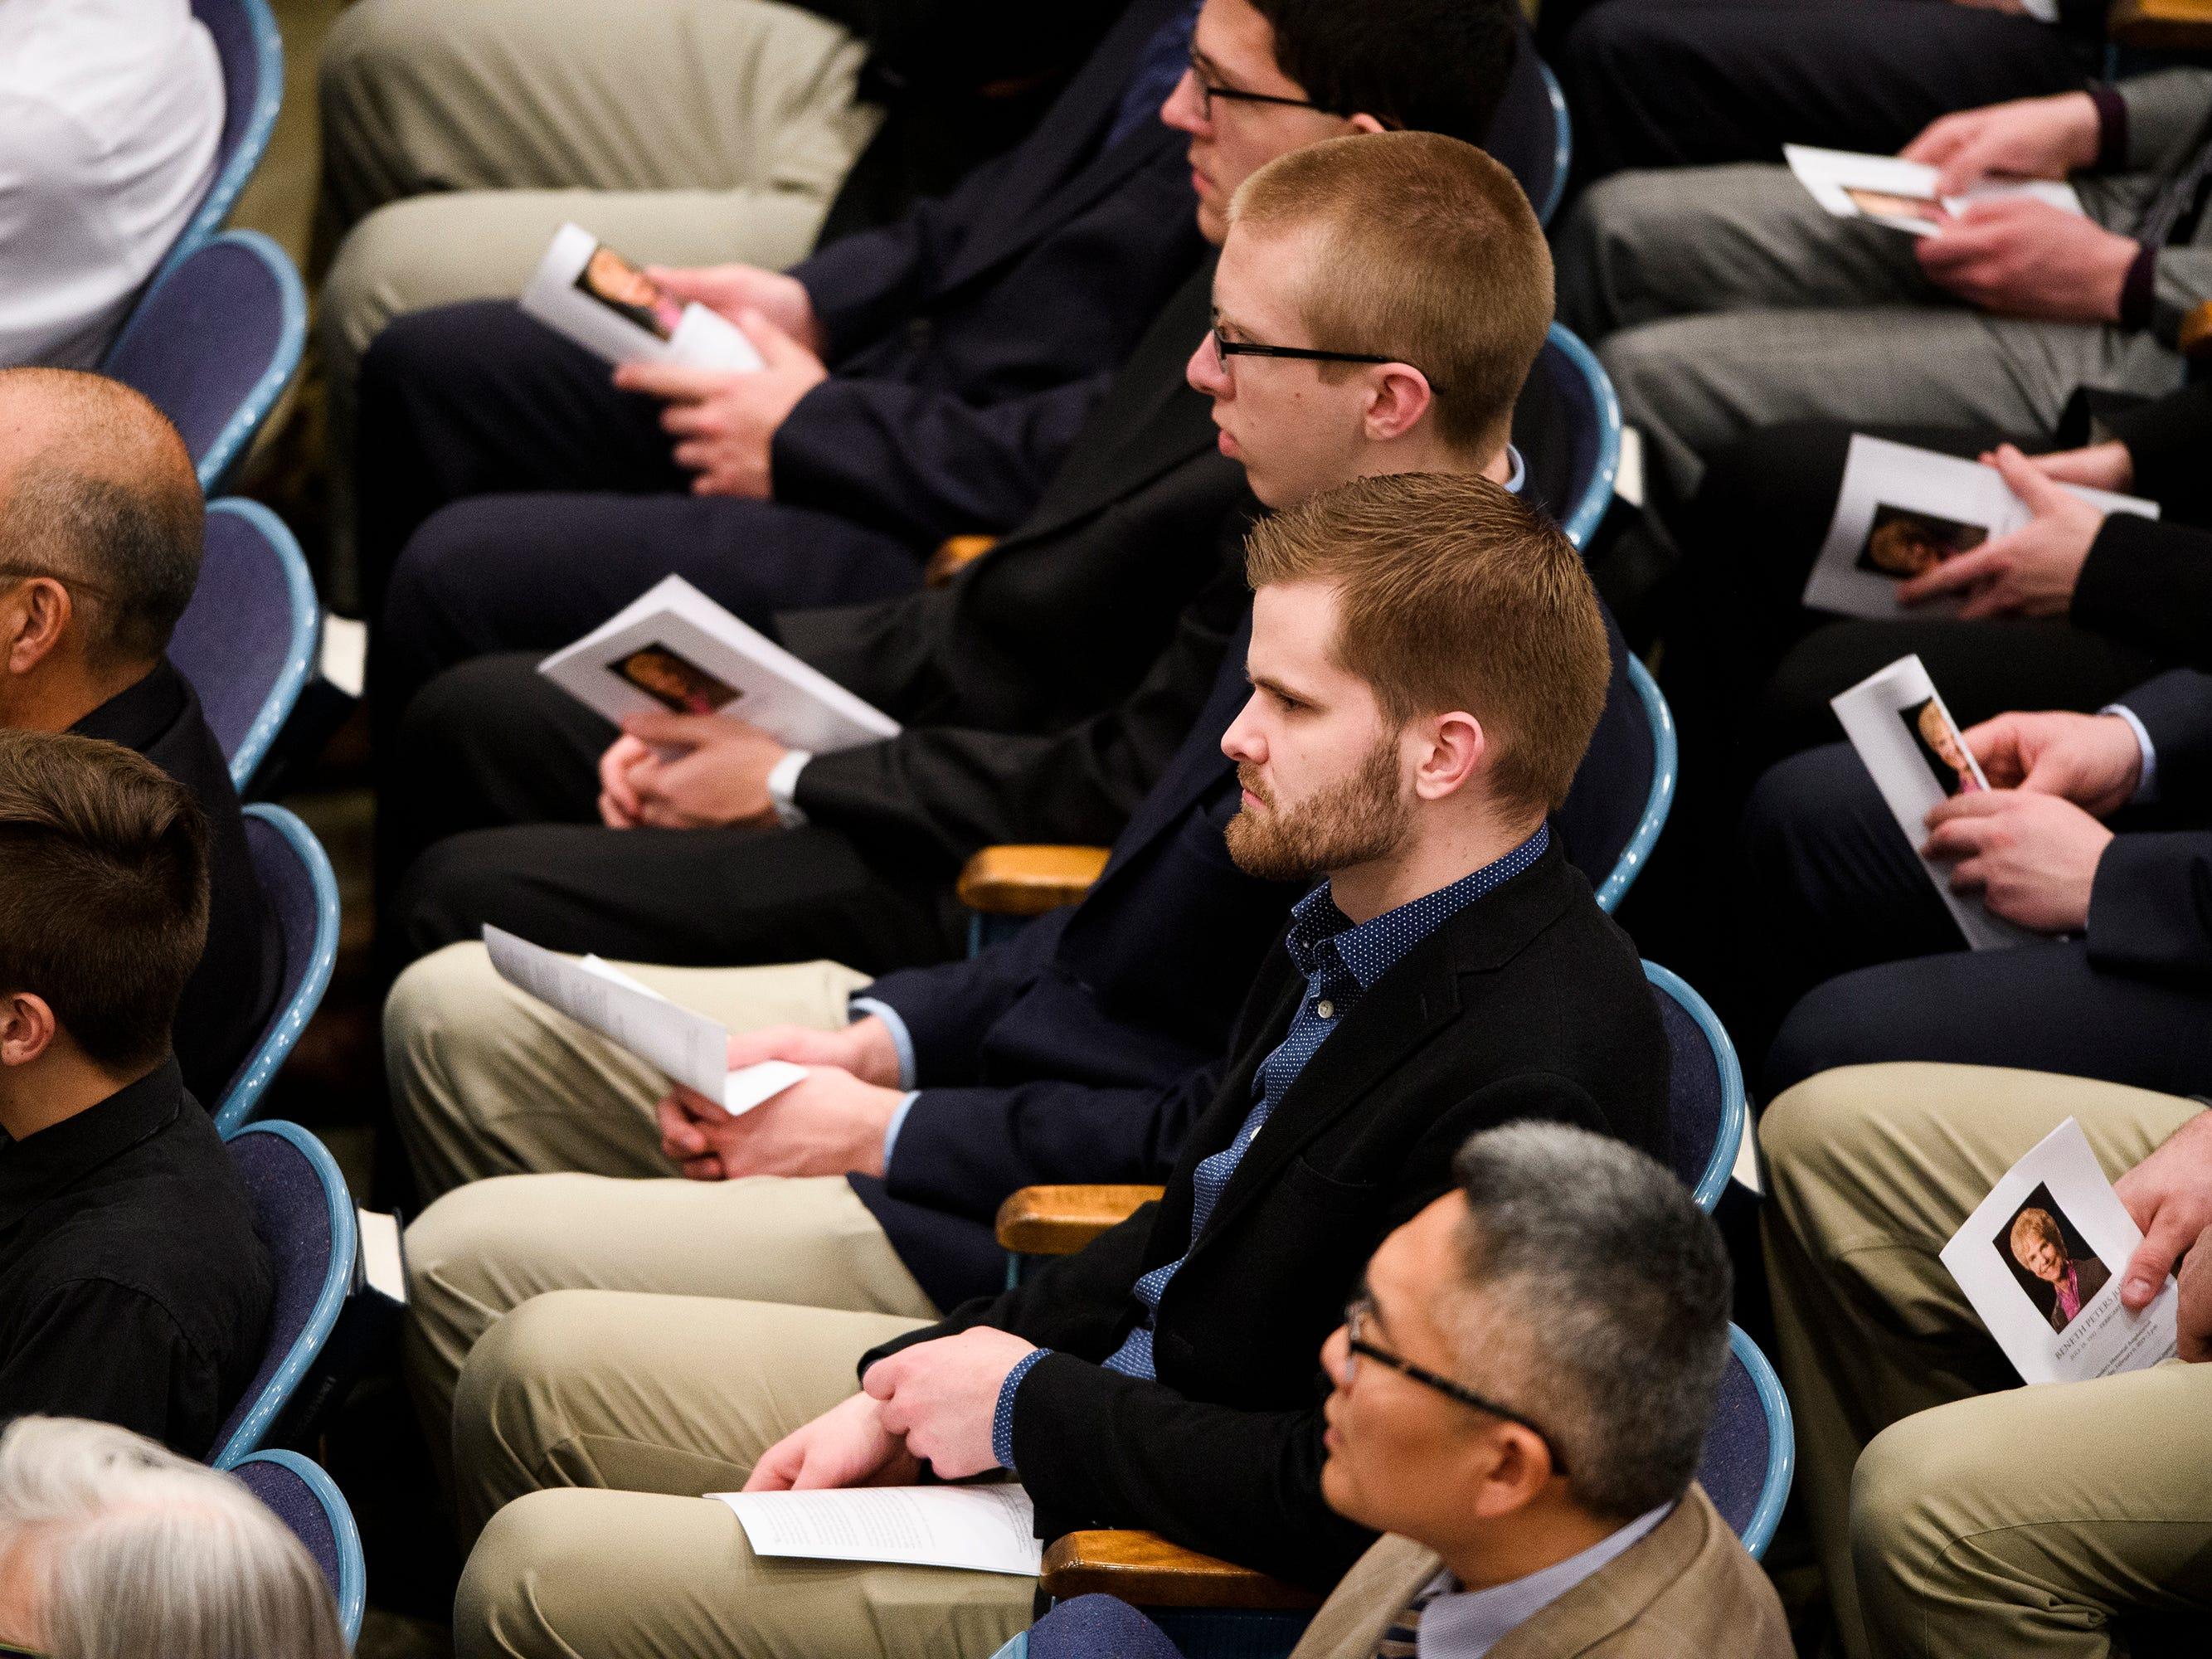 Hundreds attend the funeral service of Beneth Peters Jones at Bob Jones University on Wednesday, Feb. 6, 2019.